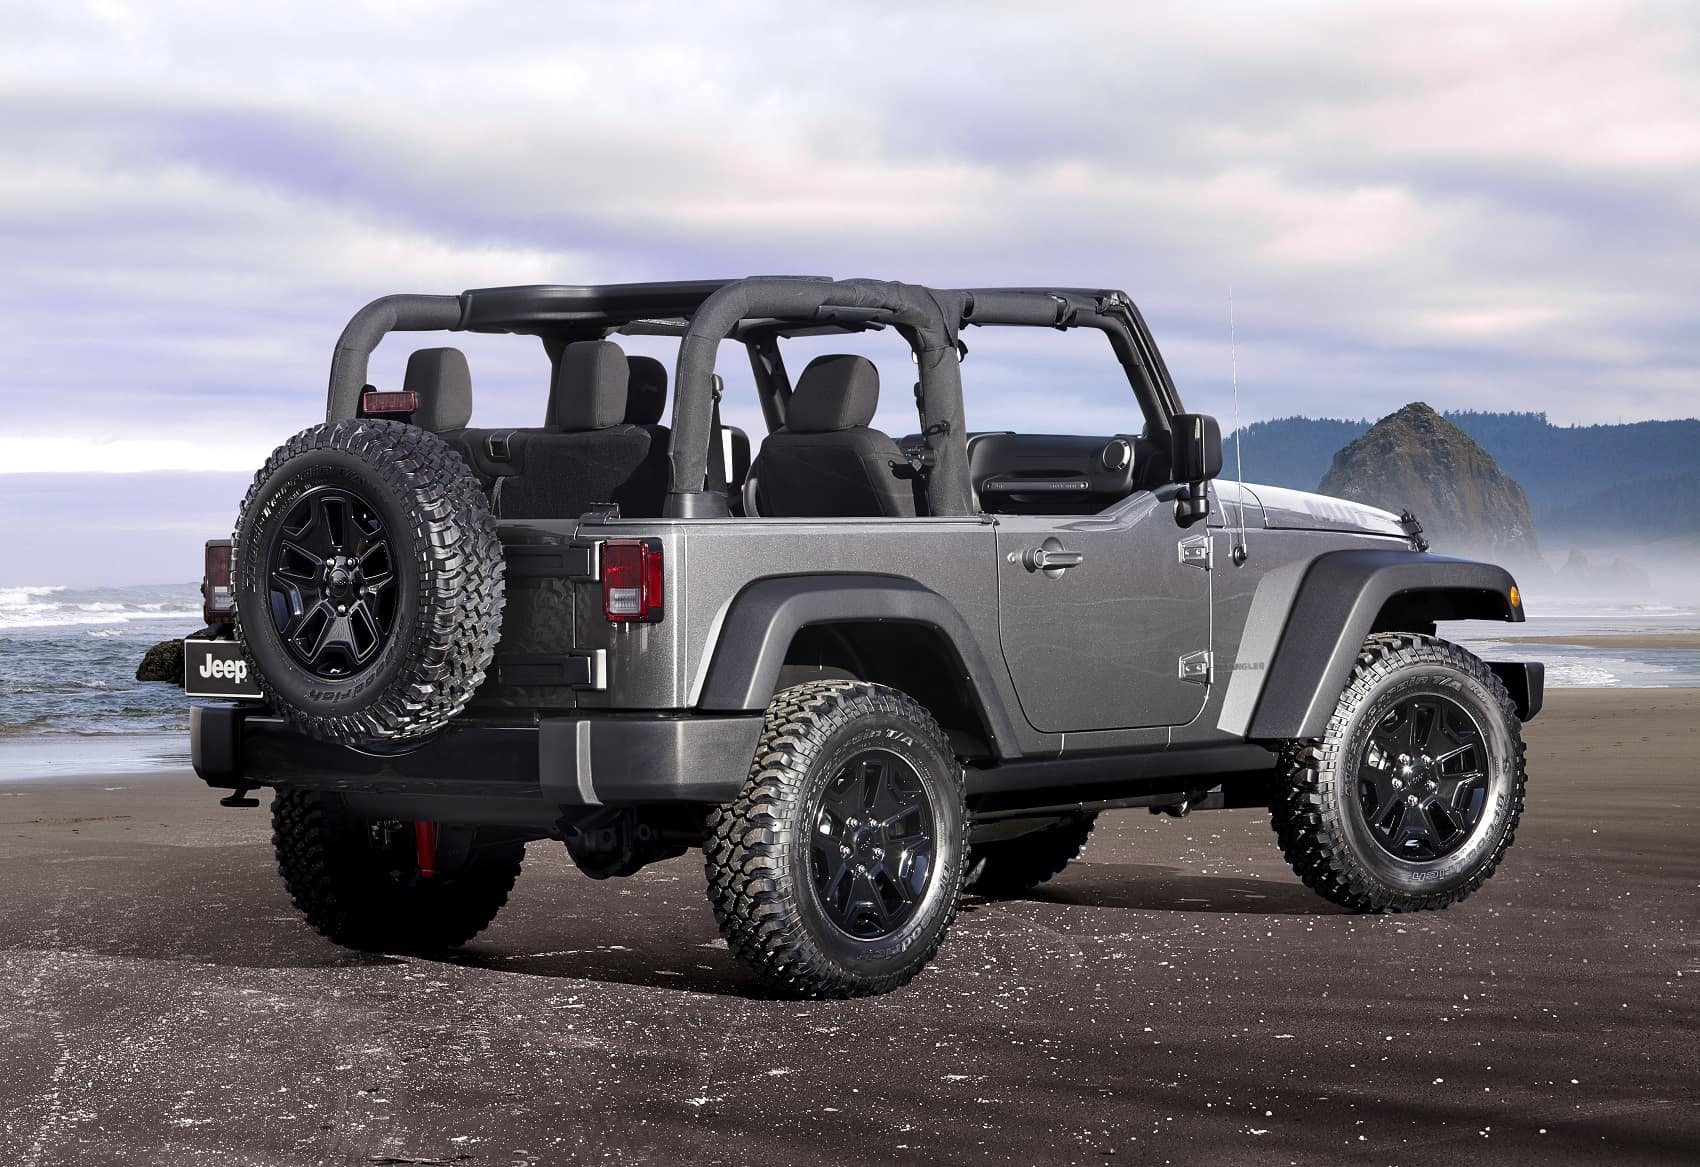 Jeep Wrangler Cambridge MA